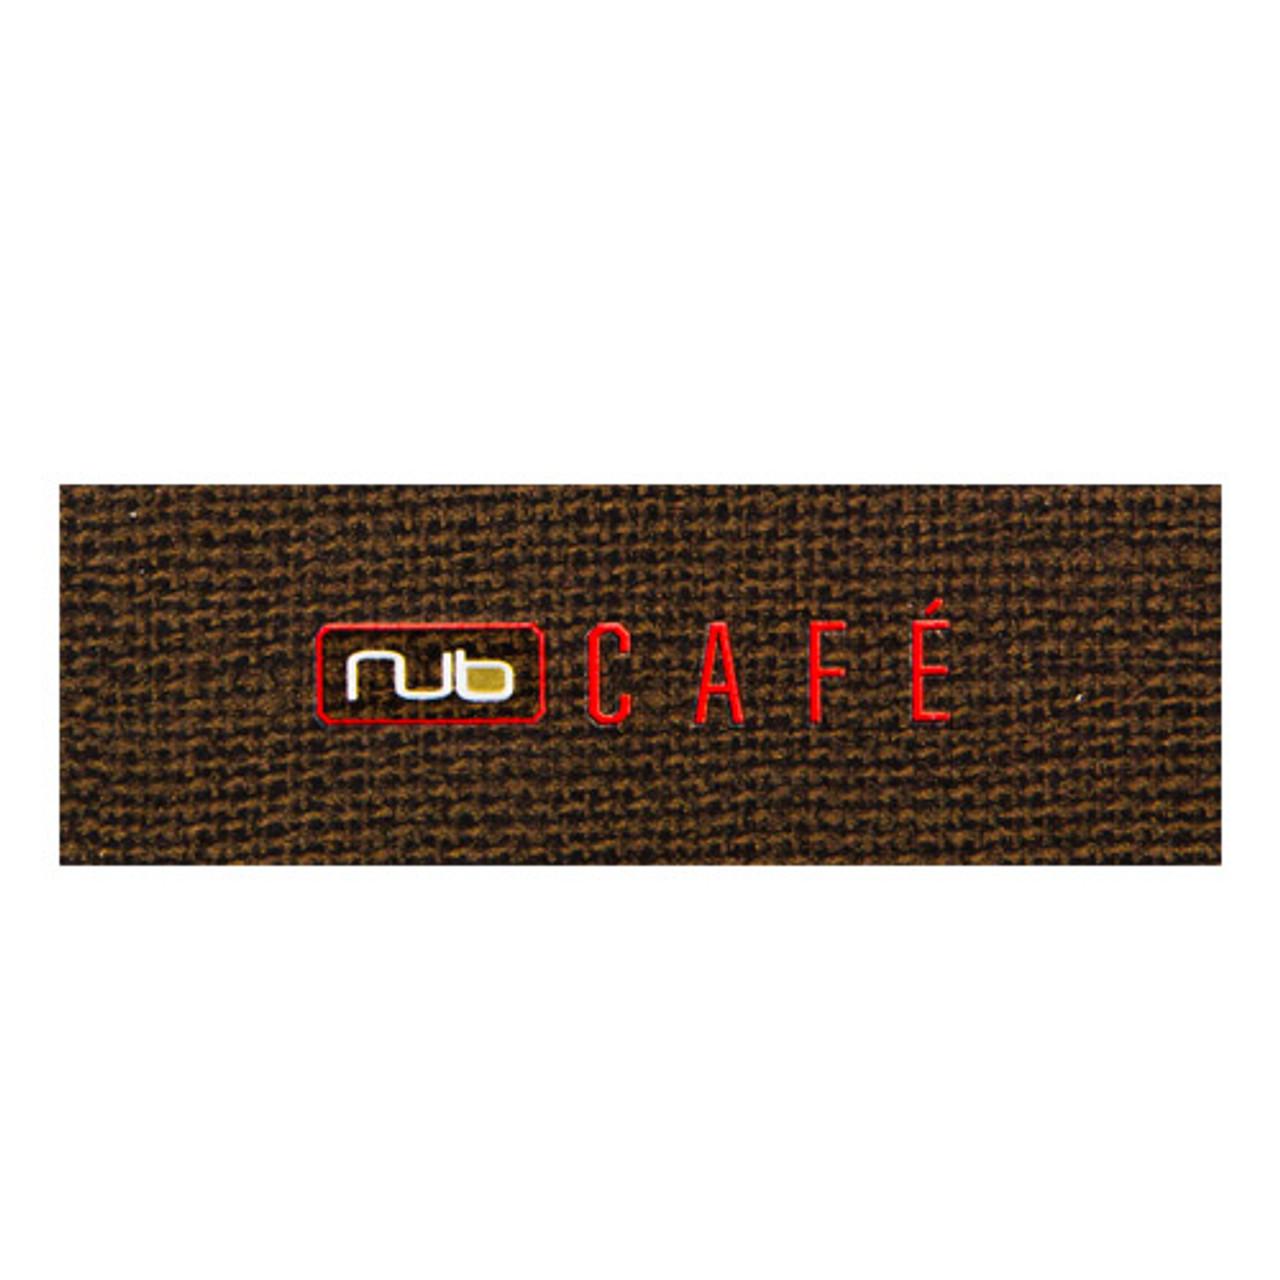 Nub Cafe Cappuccino Cigars - 4 x 60 (Box of 20)